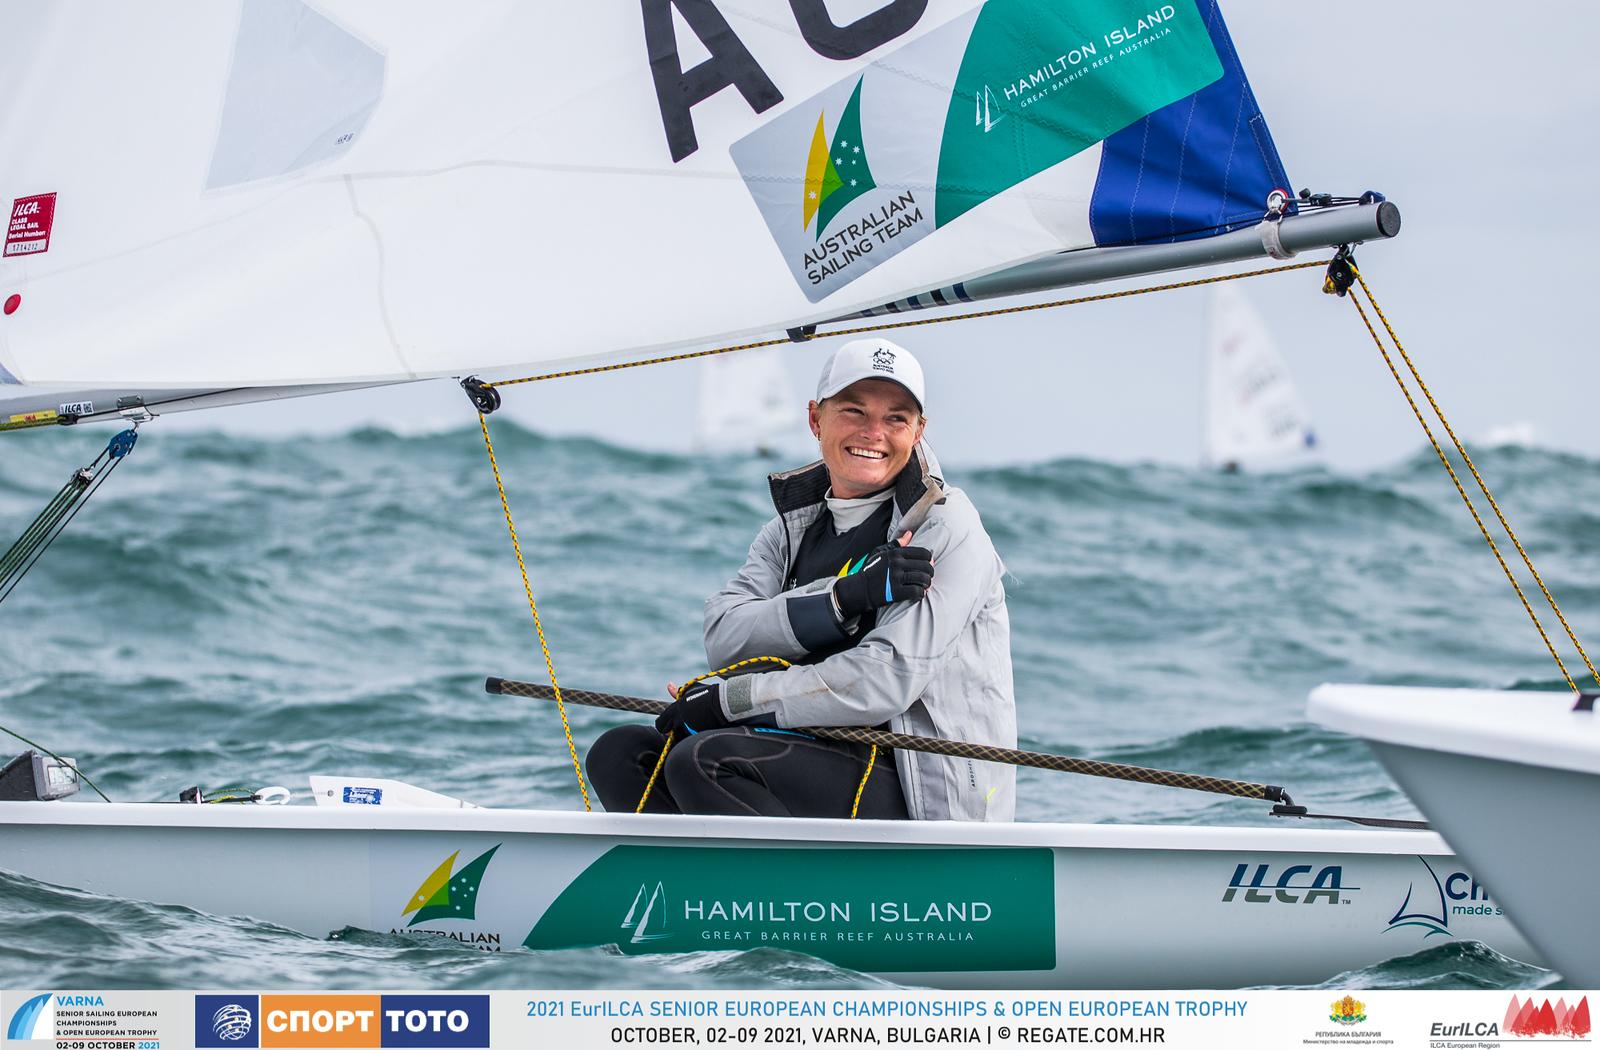 Mara Stransky on her boat smiling